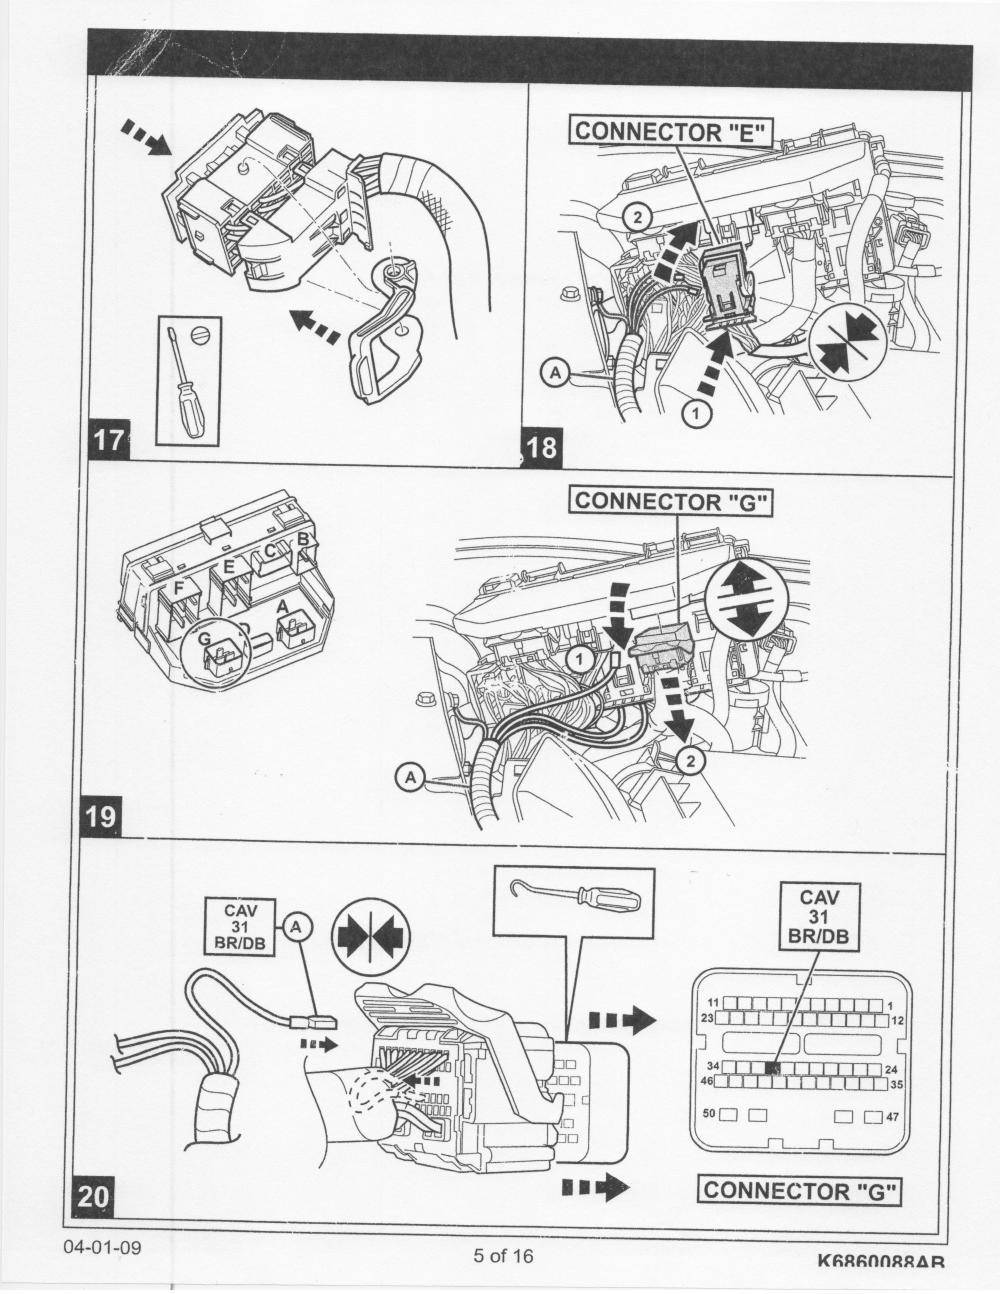 medium resolution of 2000 jeep wrangler hardtop wiring harness 41 wiring 2008 jeep wrangler starter wiring diagram 2008 jeep wrangler radio wiring diagram